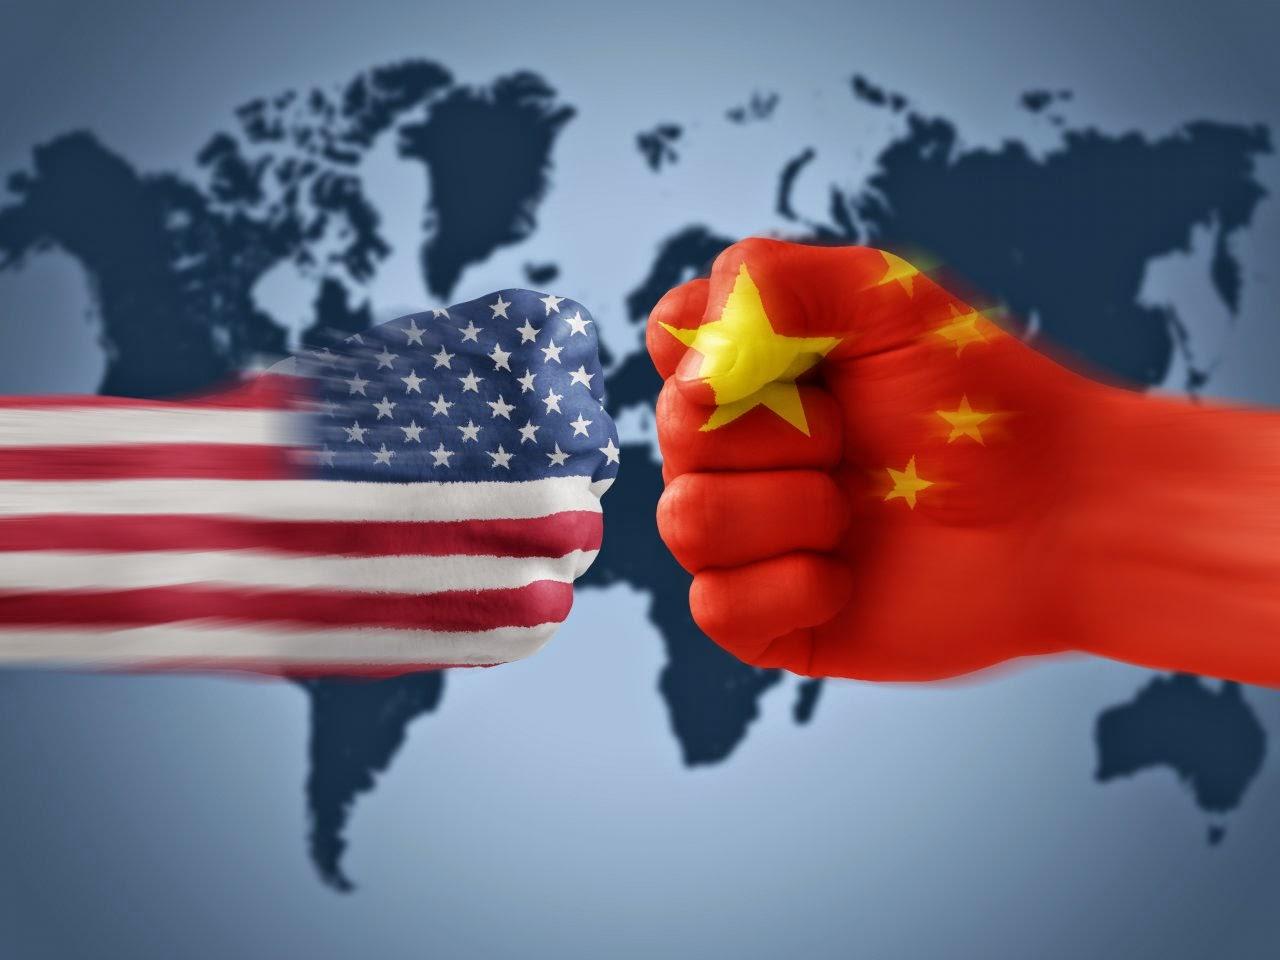 O Μύθος της Κίνας ως Υπερδύναμη Αόρατα Γεγονότα